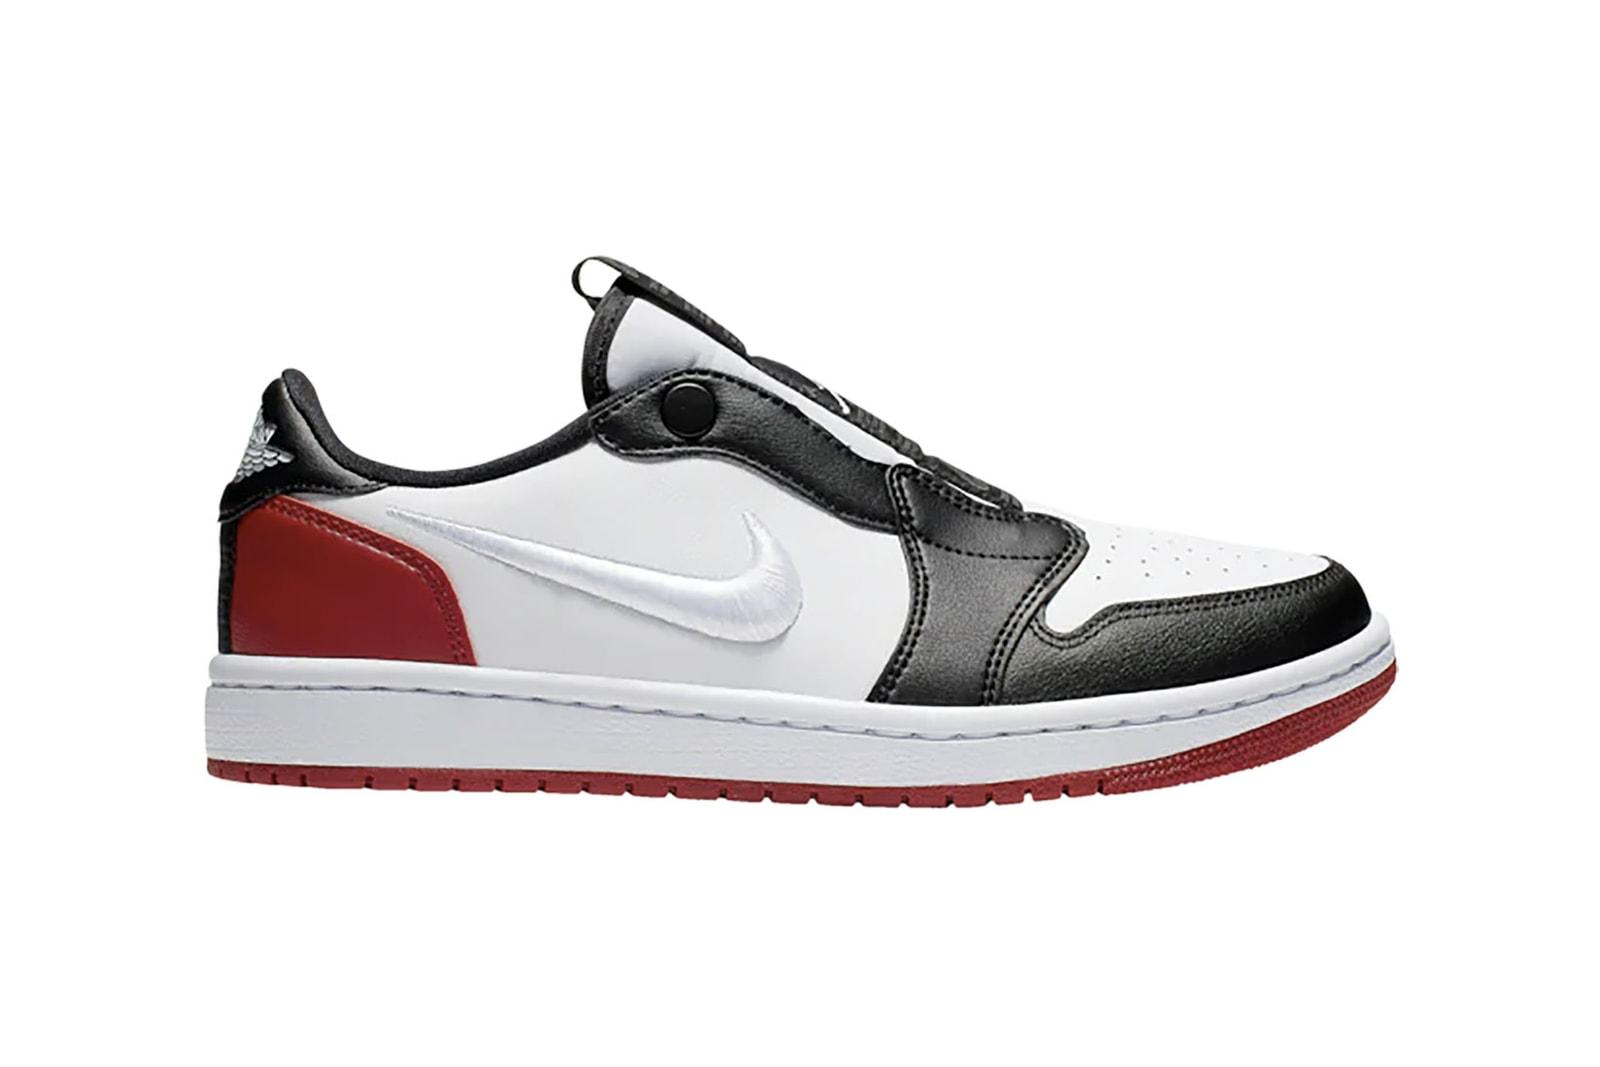 nike adidas reebok puma air max 90 af1 daybreak falcon jordan retro zoom stefan janoski sneakers